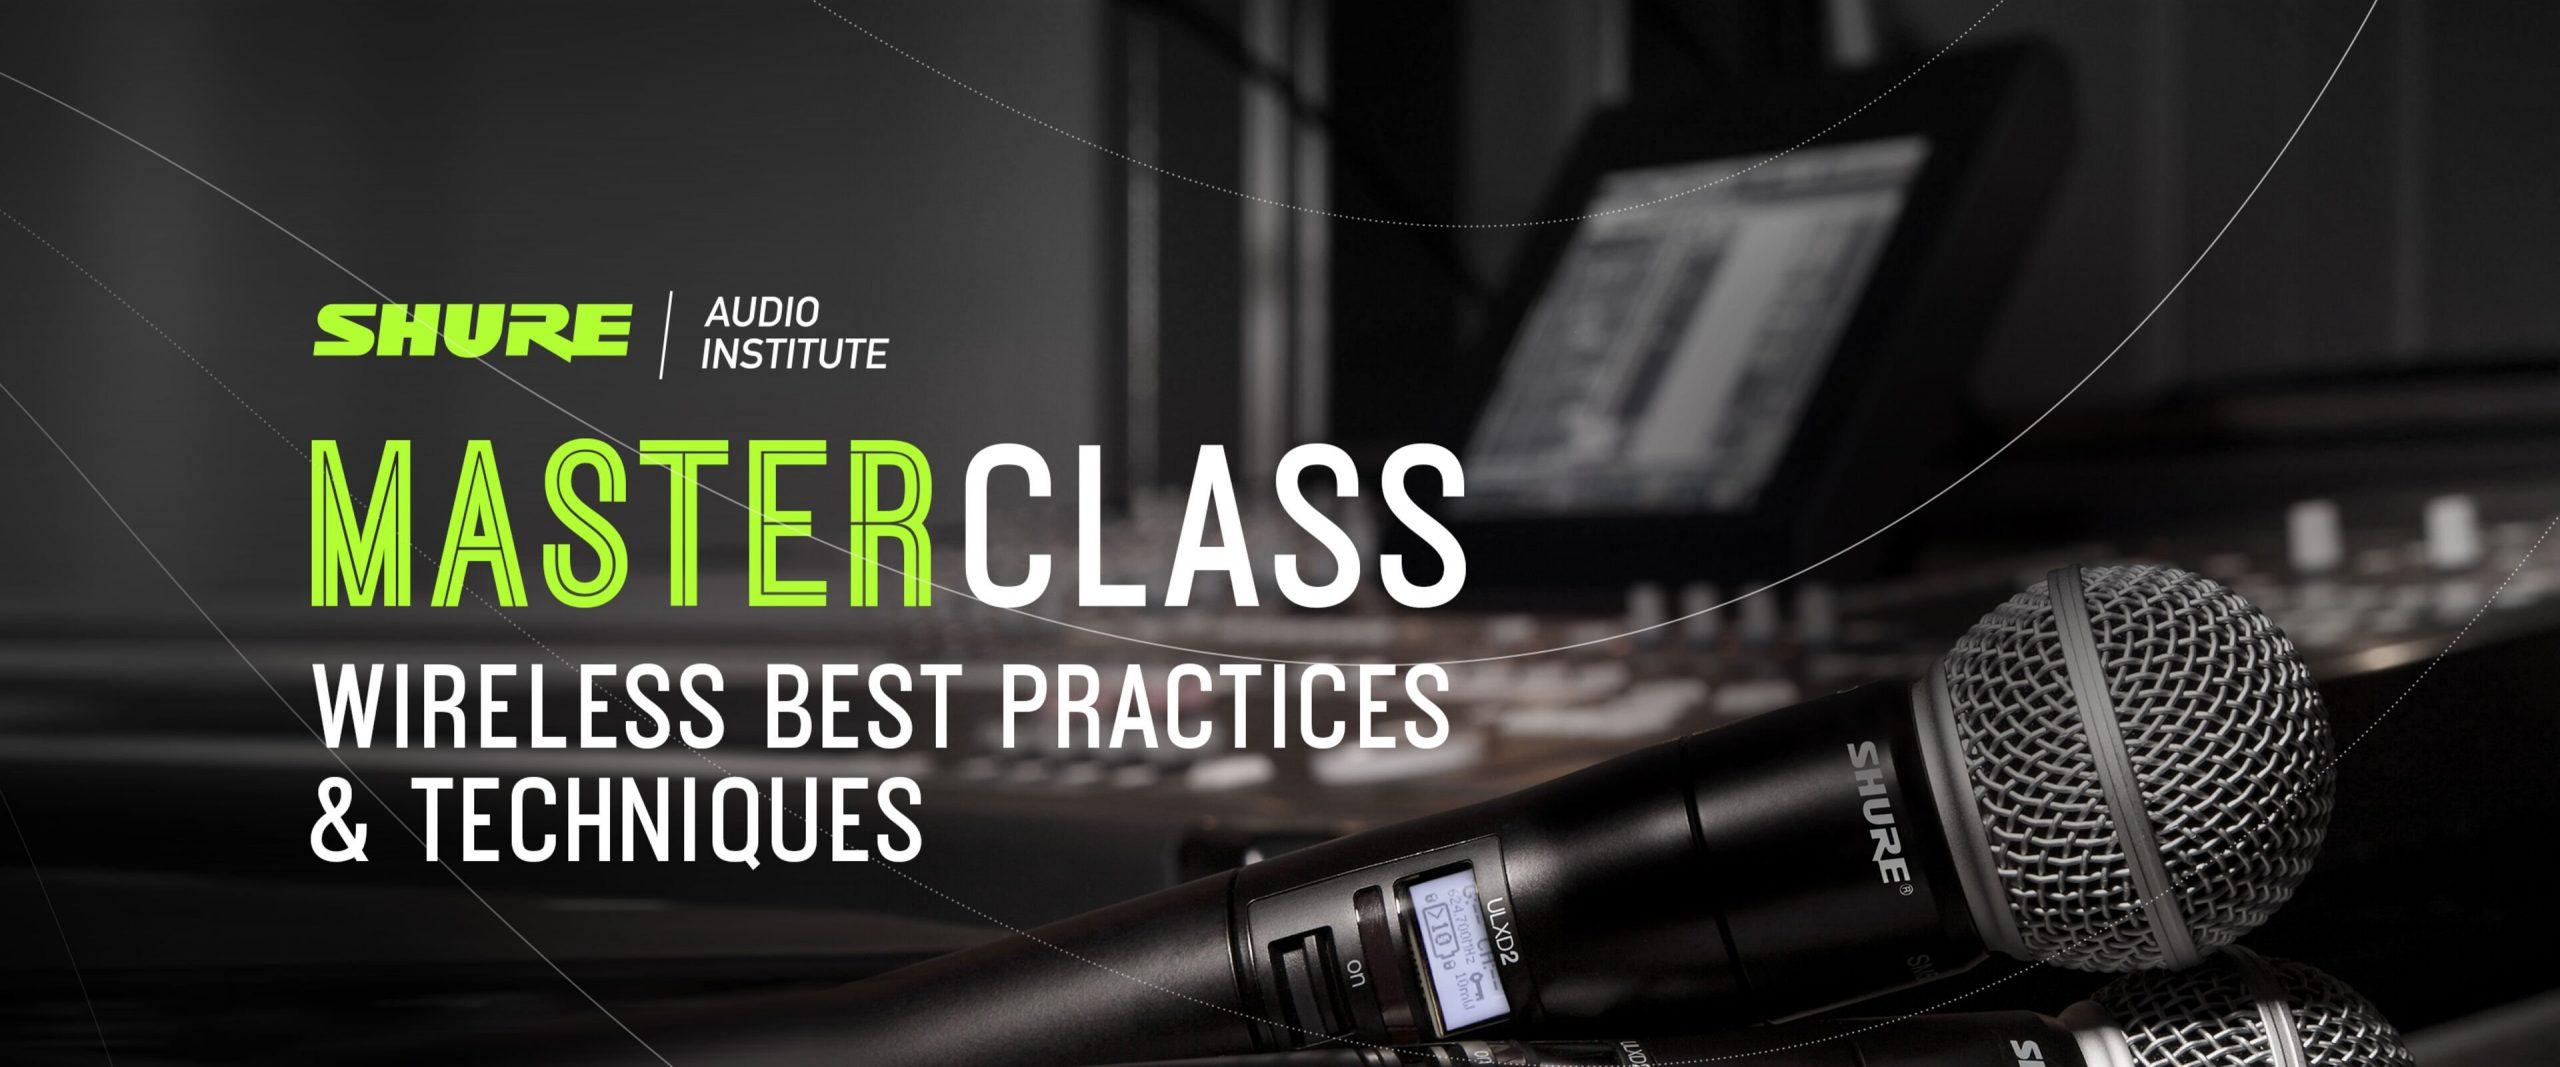 Shure Masterclass Wireless Best Practices & Techniques (NL)